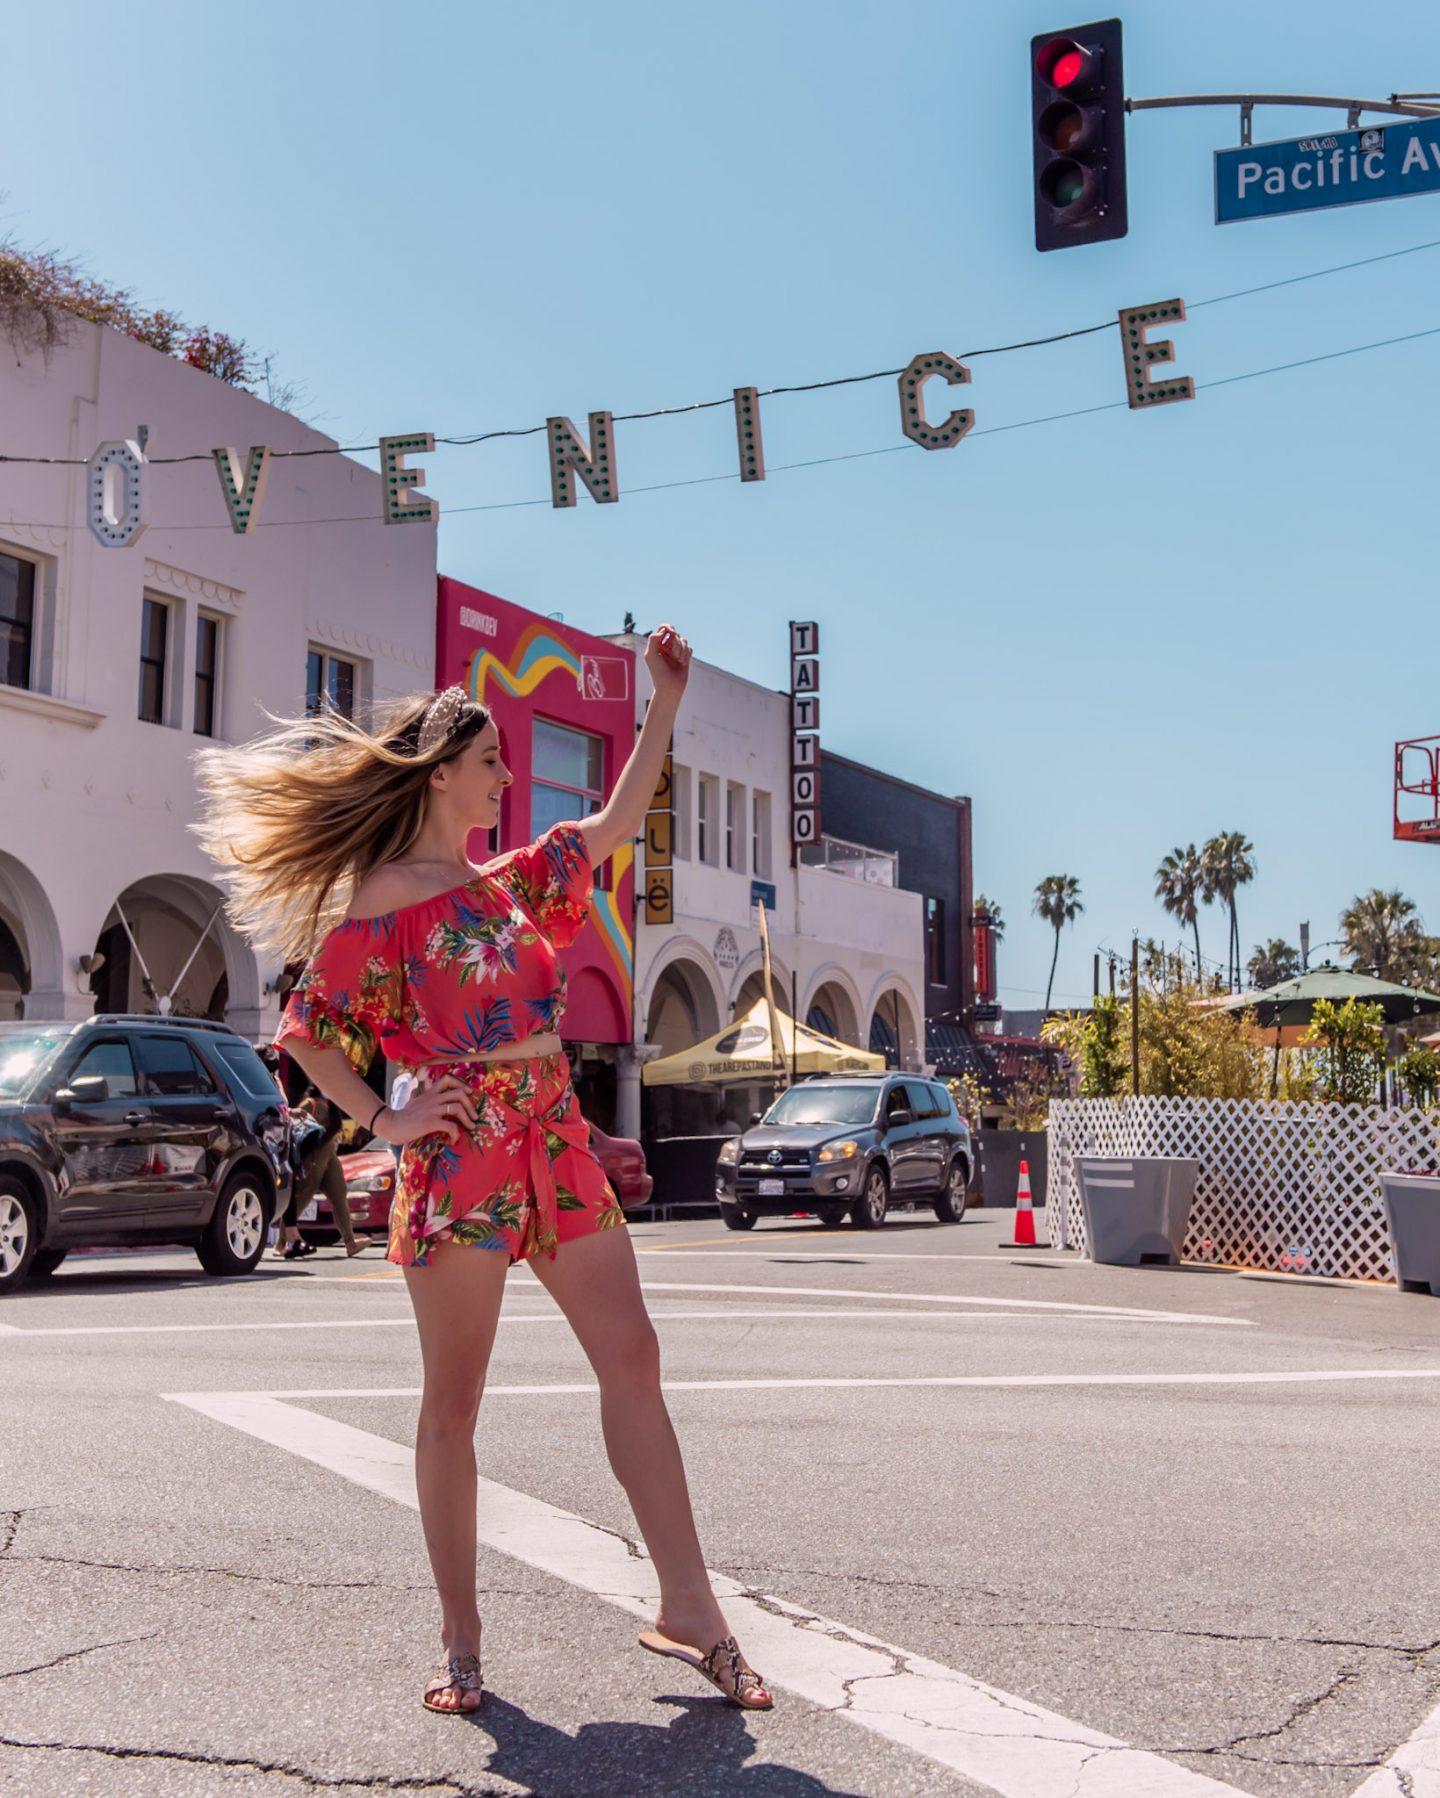 venice sign in venice beach california